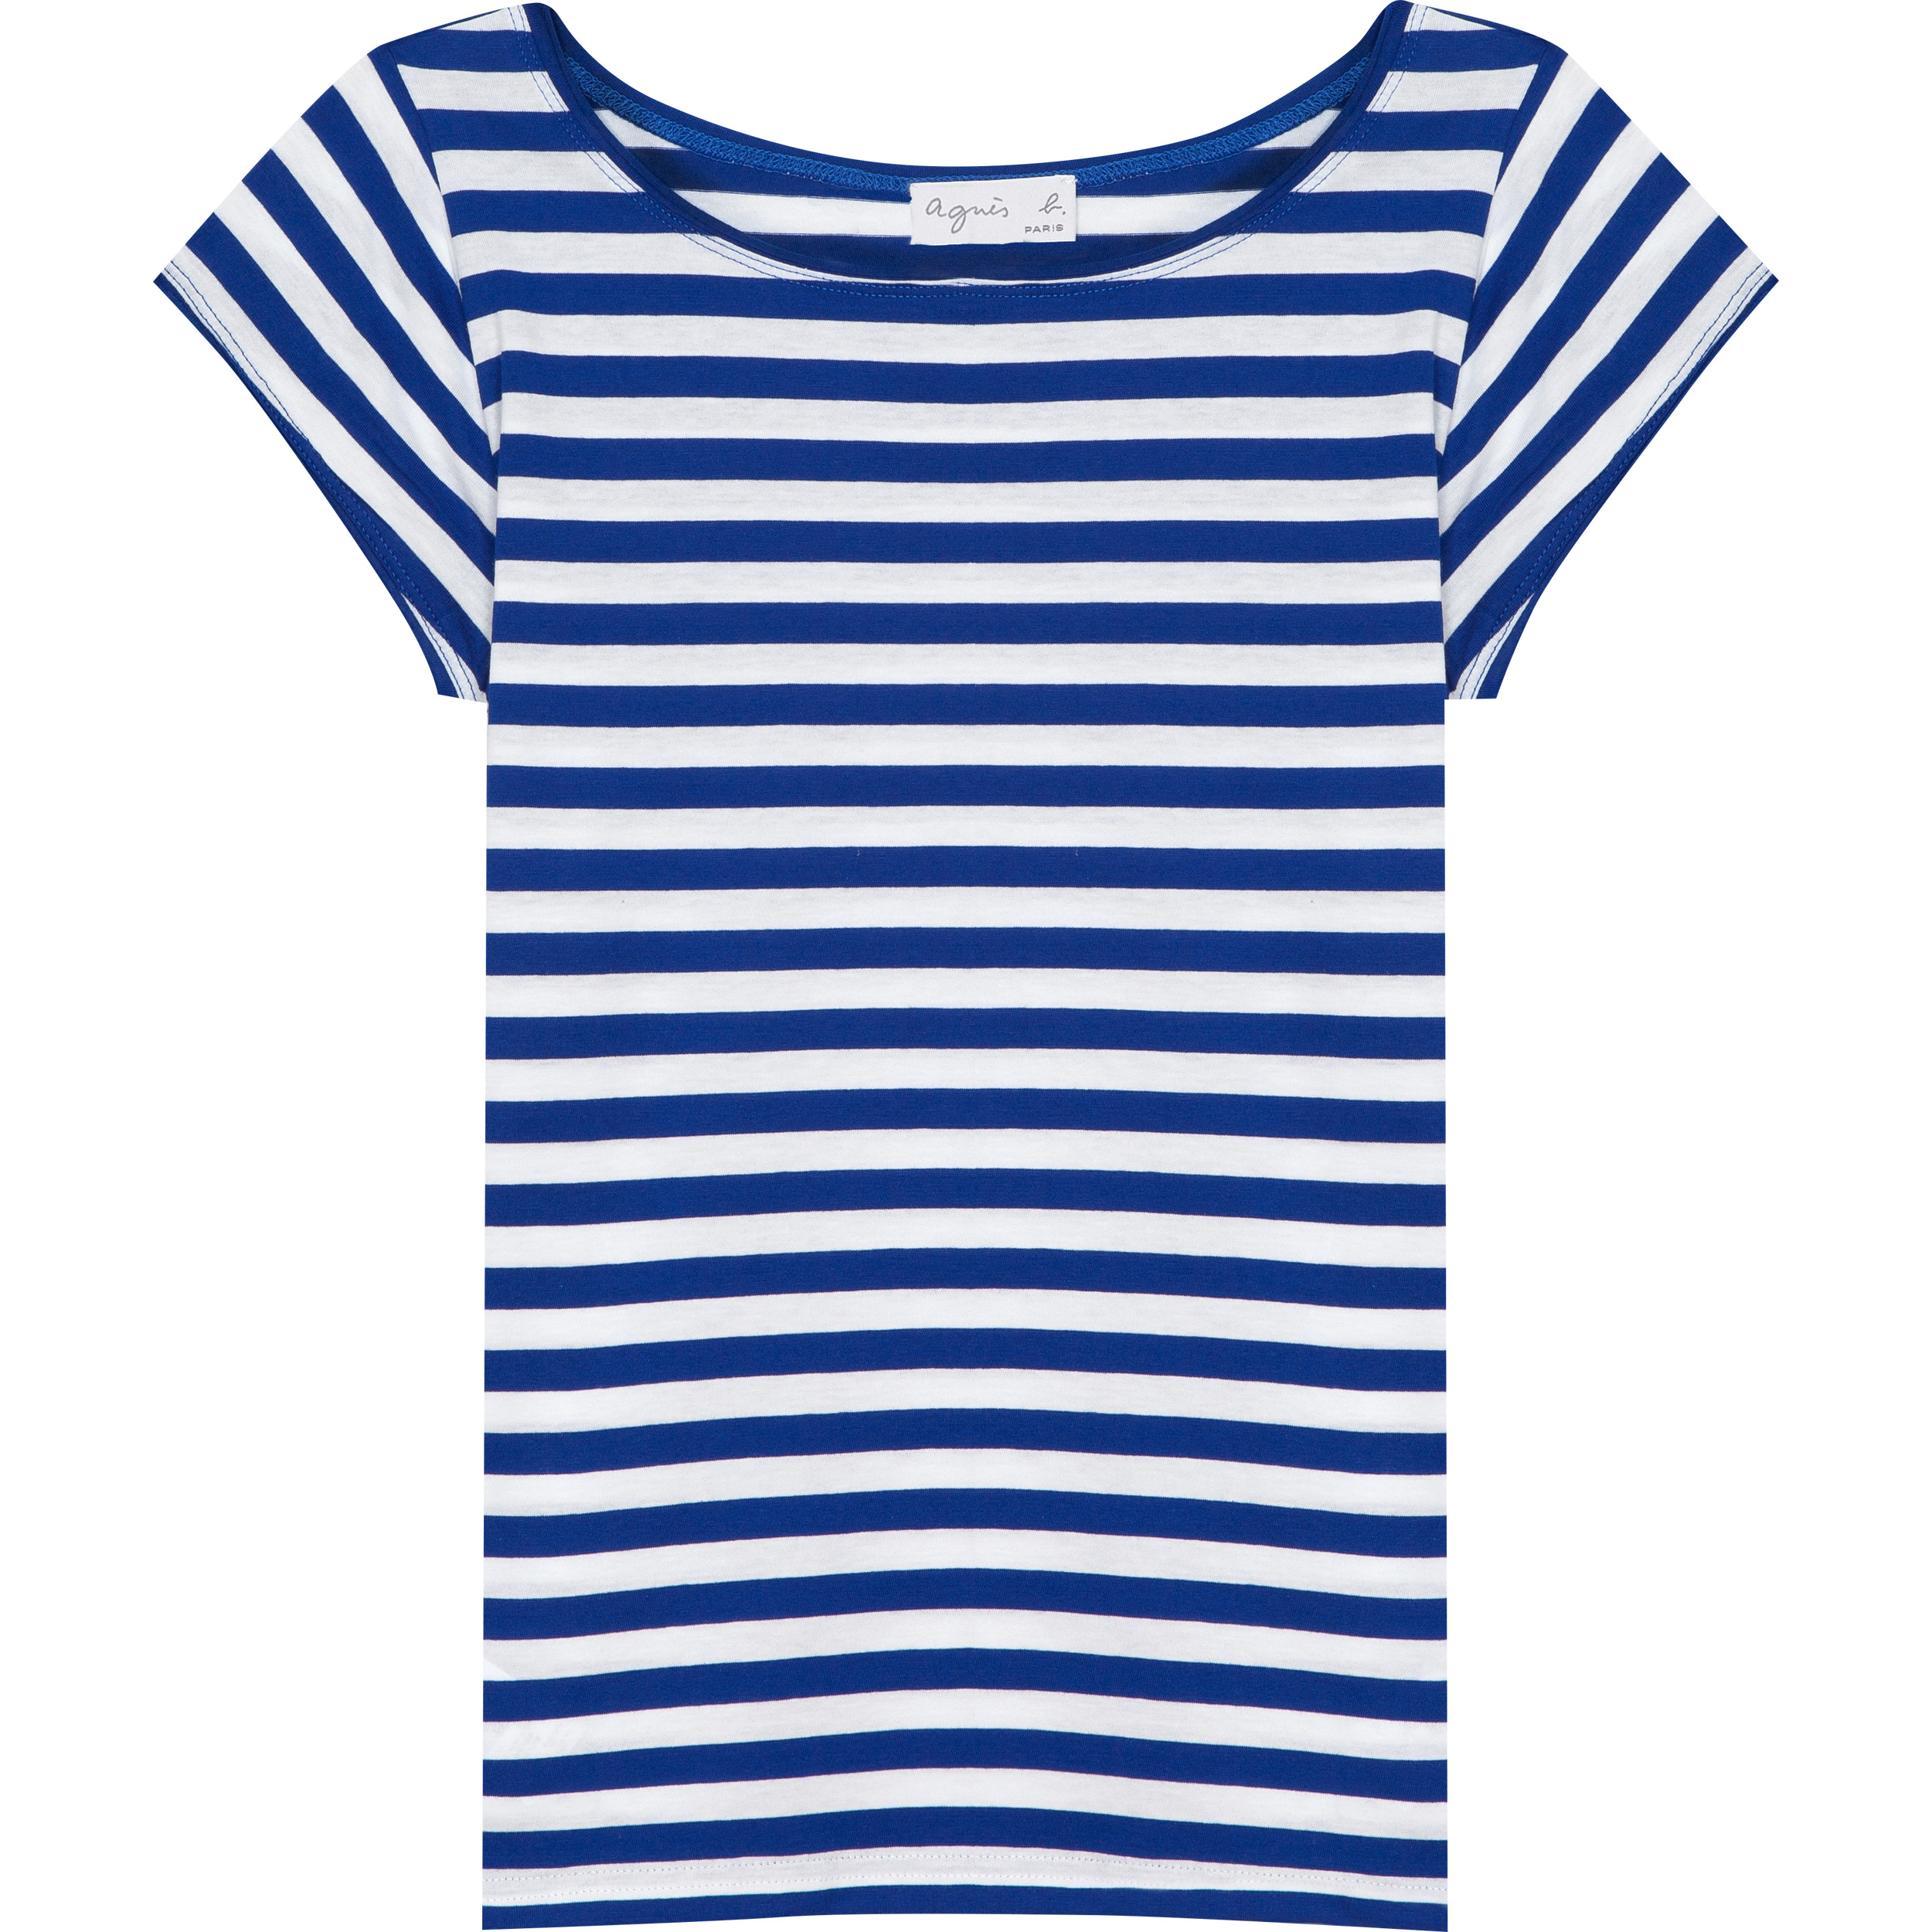 Australie Shirt T Bluewhite Agnès In B Lyst Blue aqwvXnnBWx